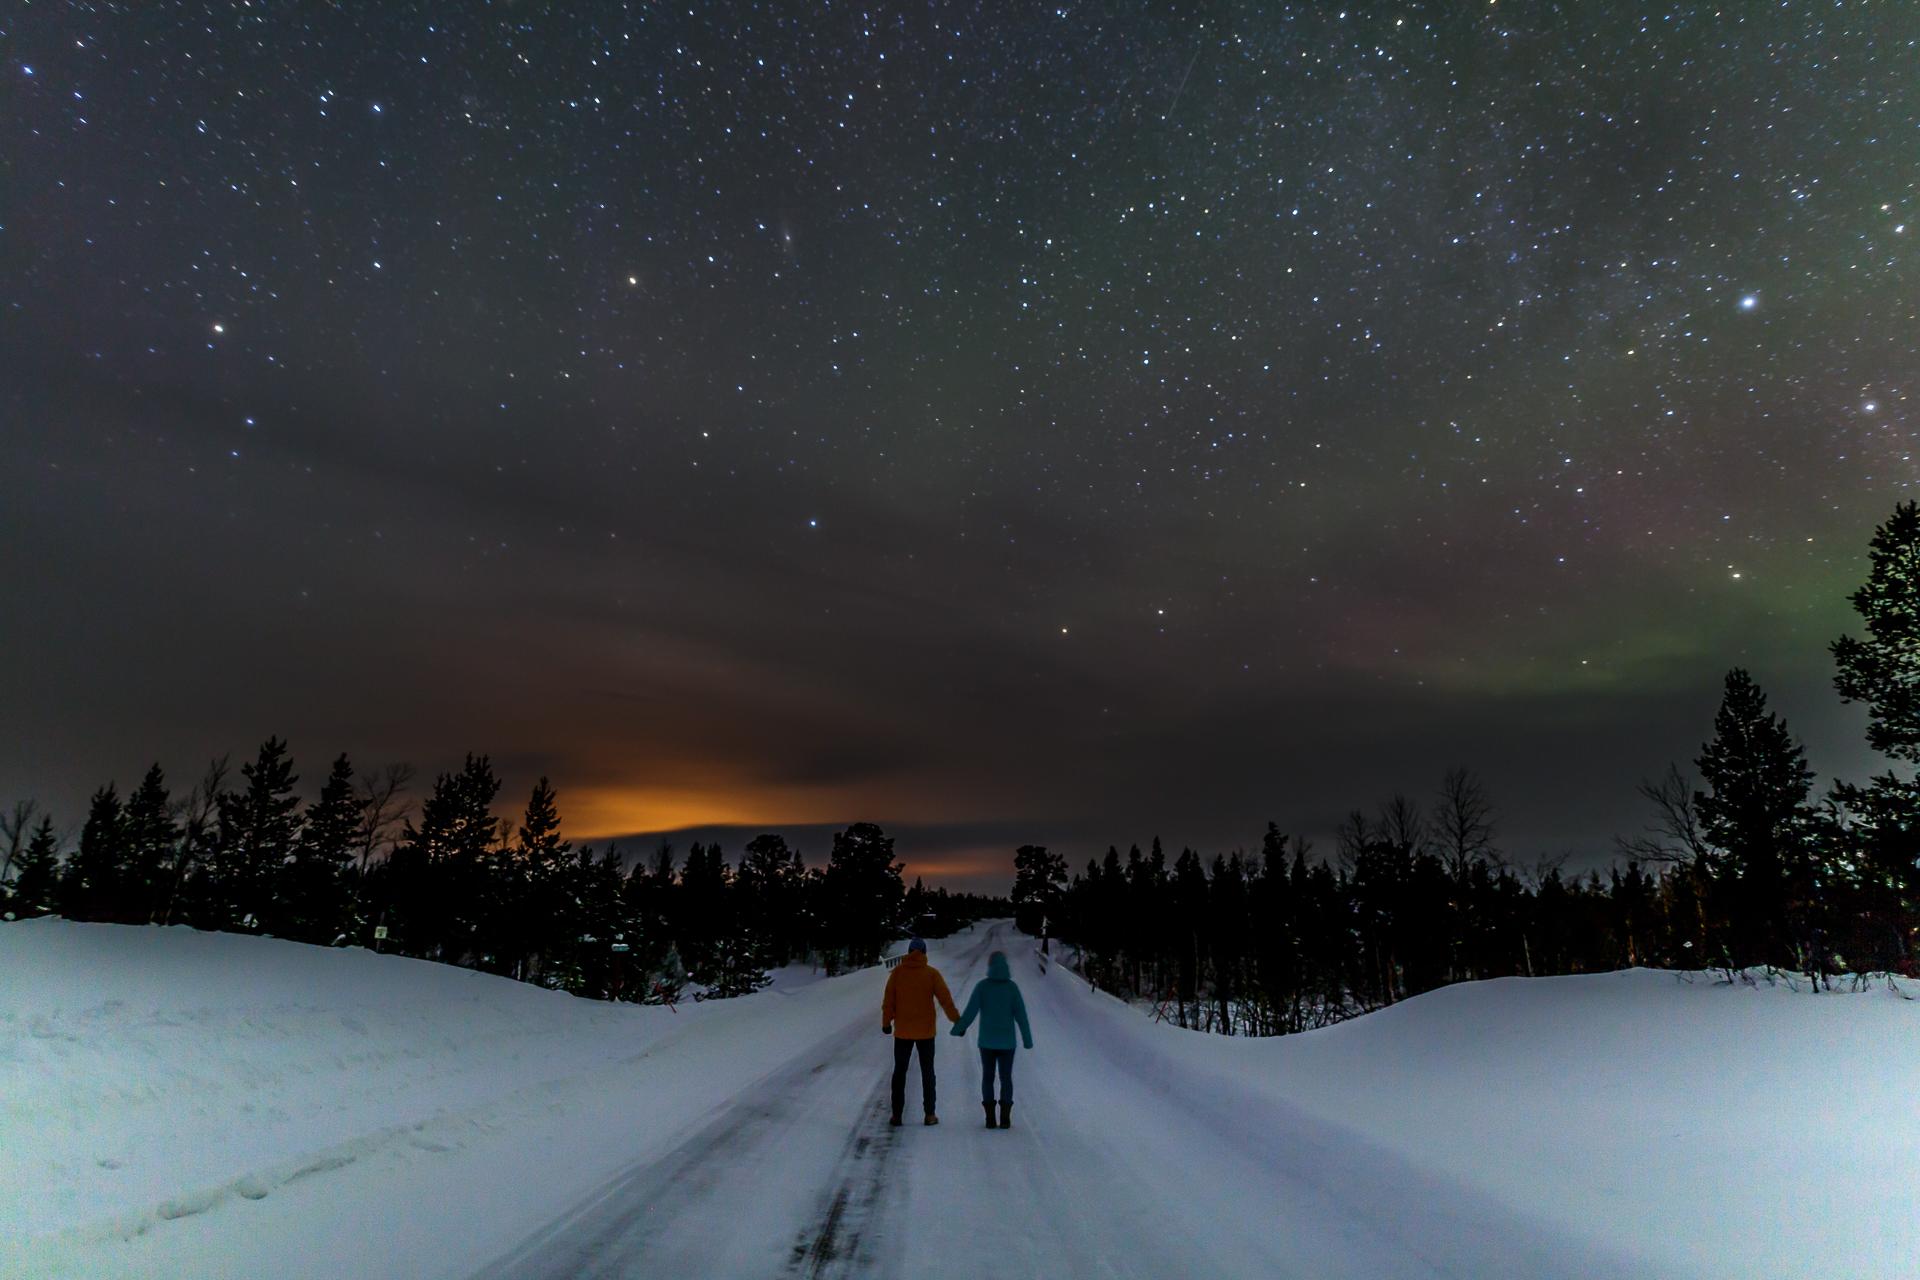 Kaamanen-Finnland